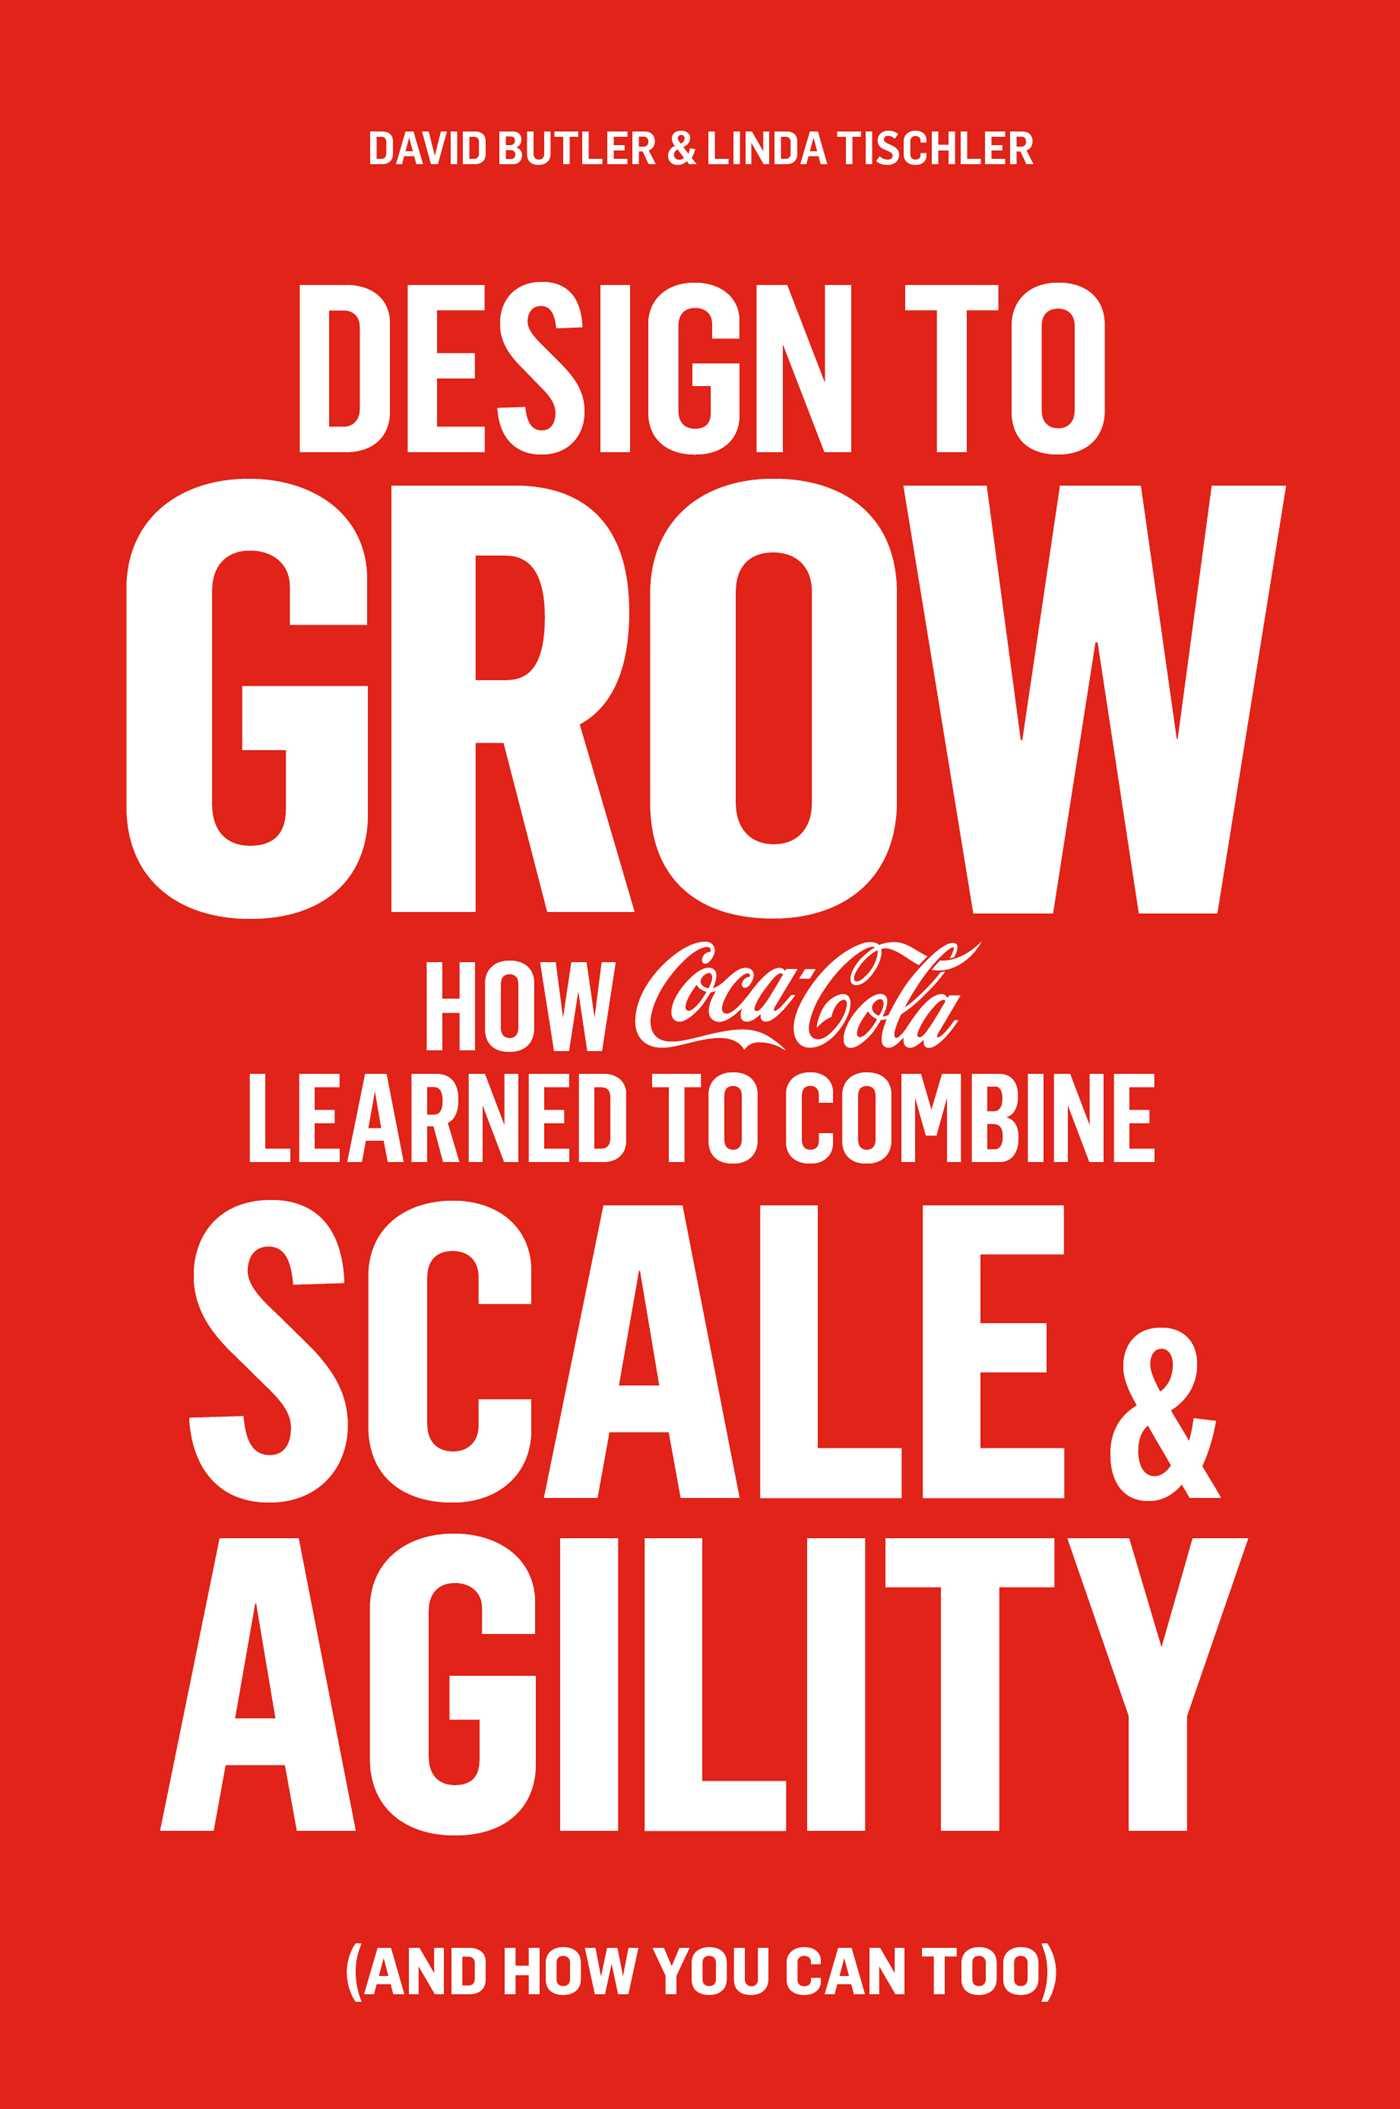 Design to grow 9781451671827 hr